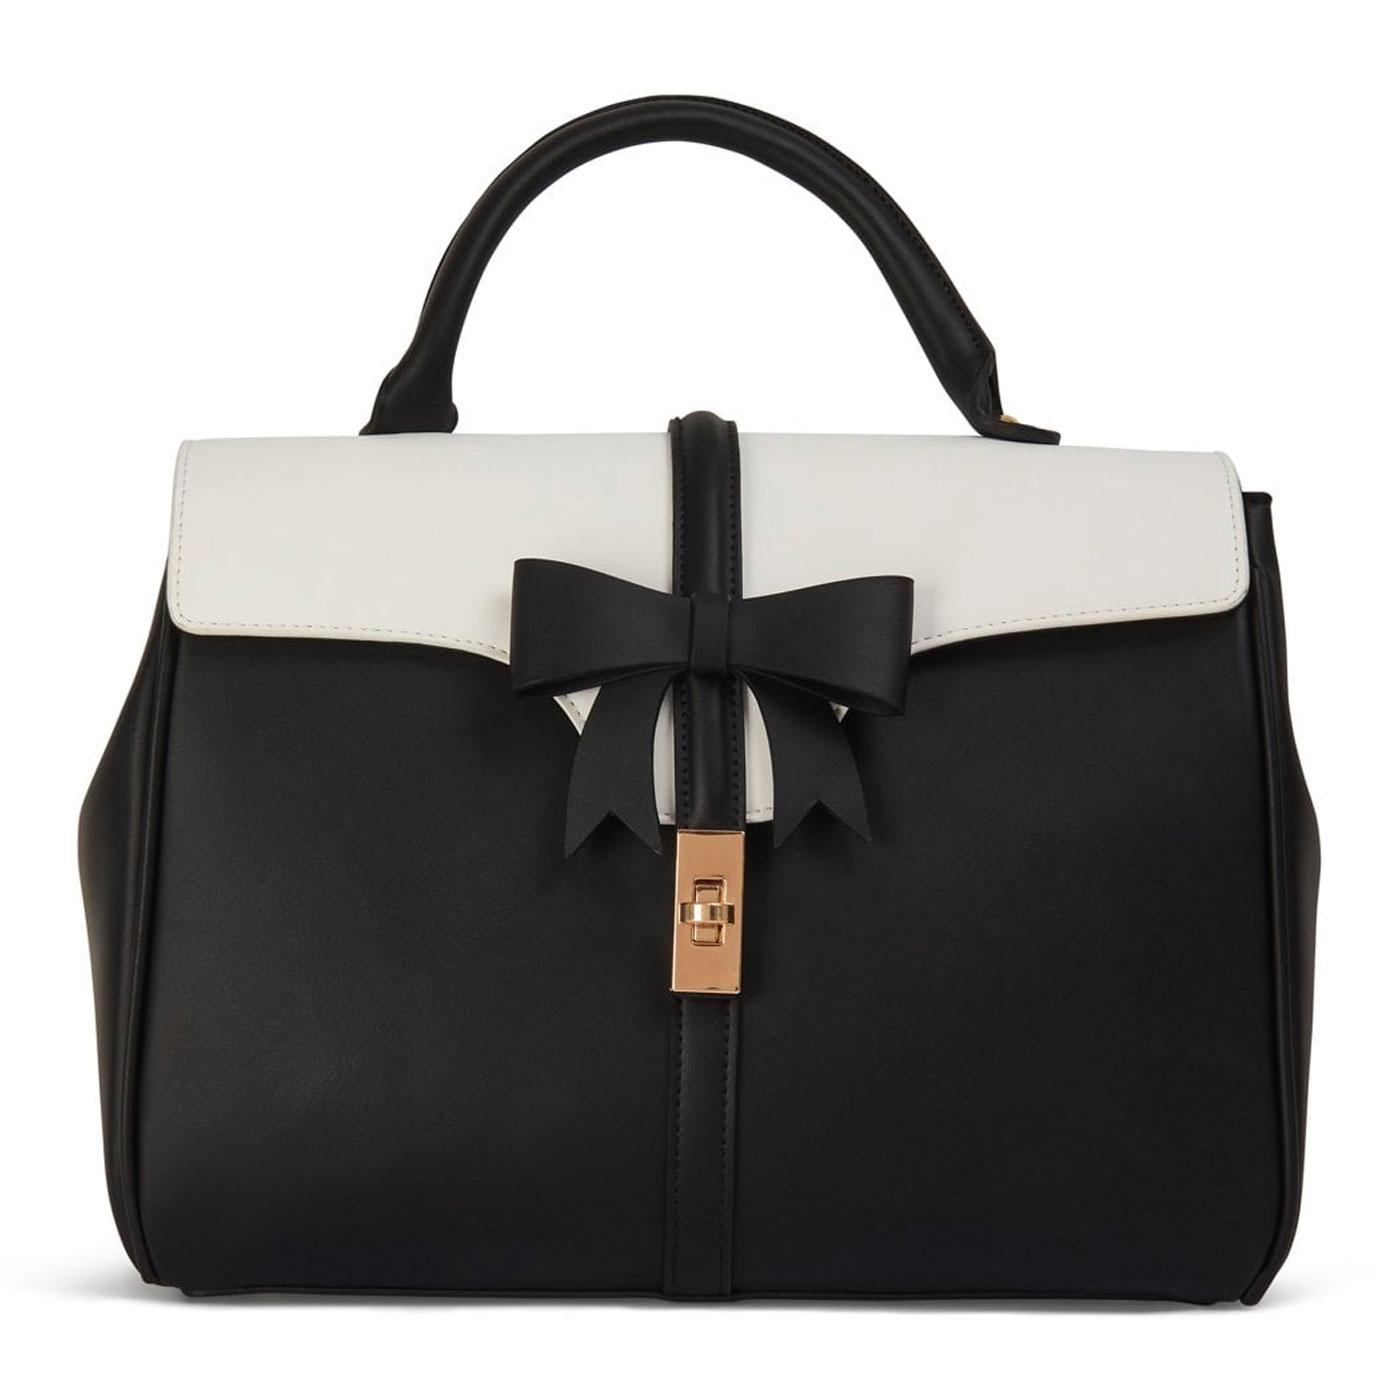 Roberta LULU HUN Retro Vintage Bow Bag in Black